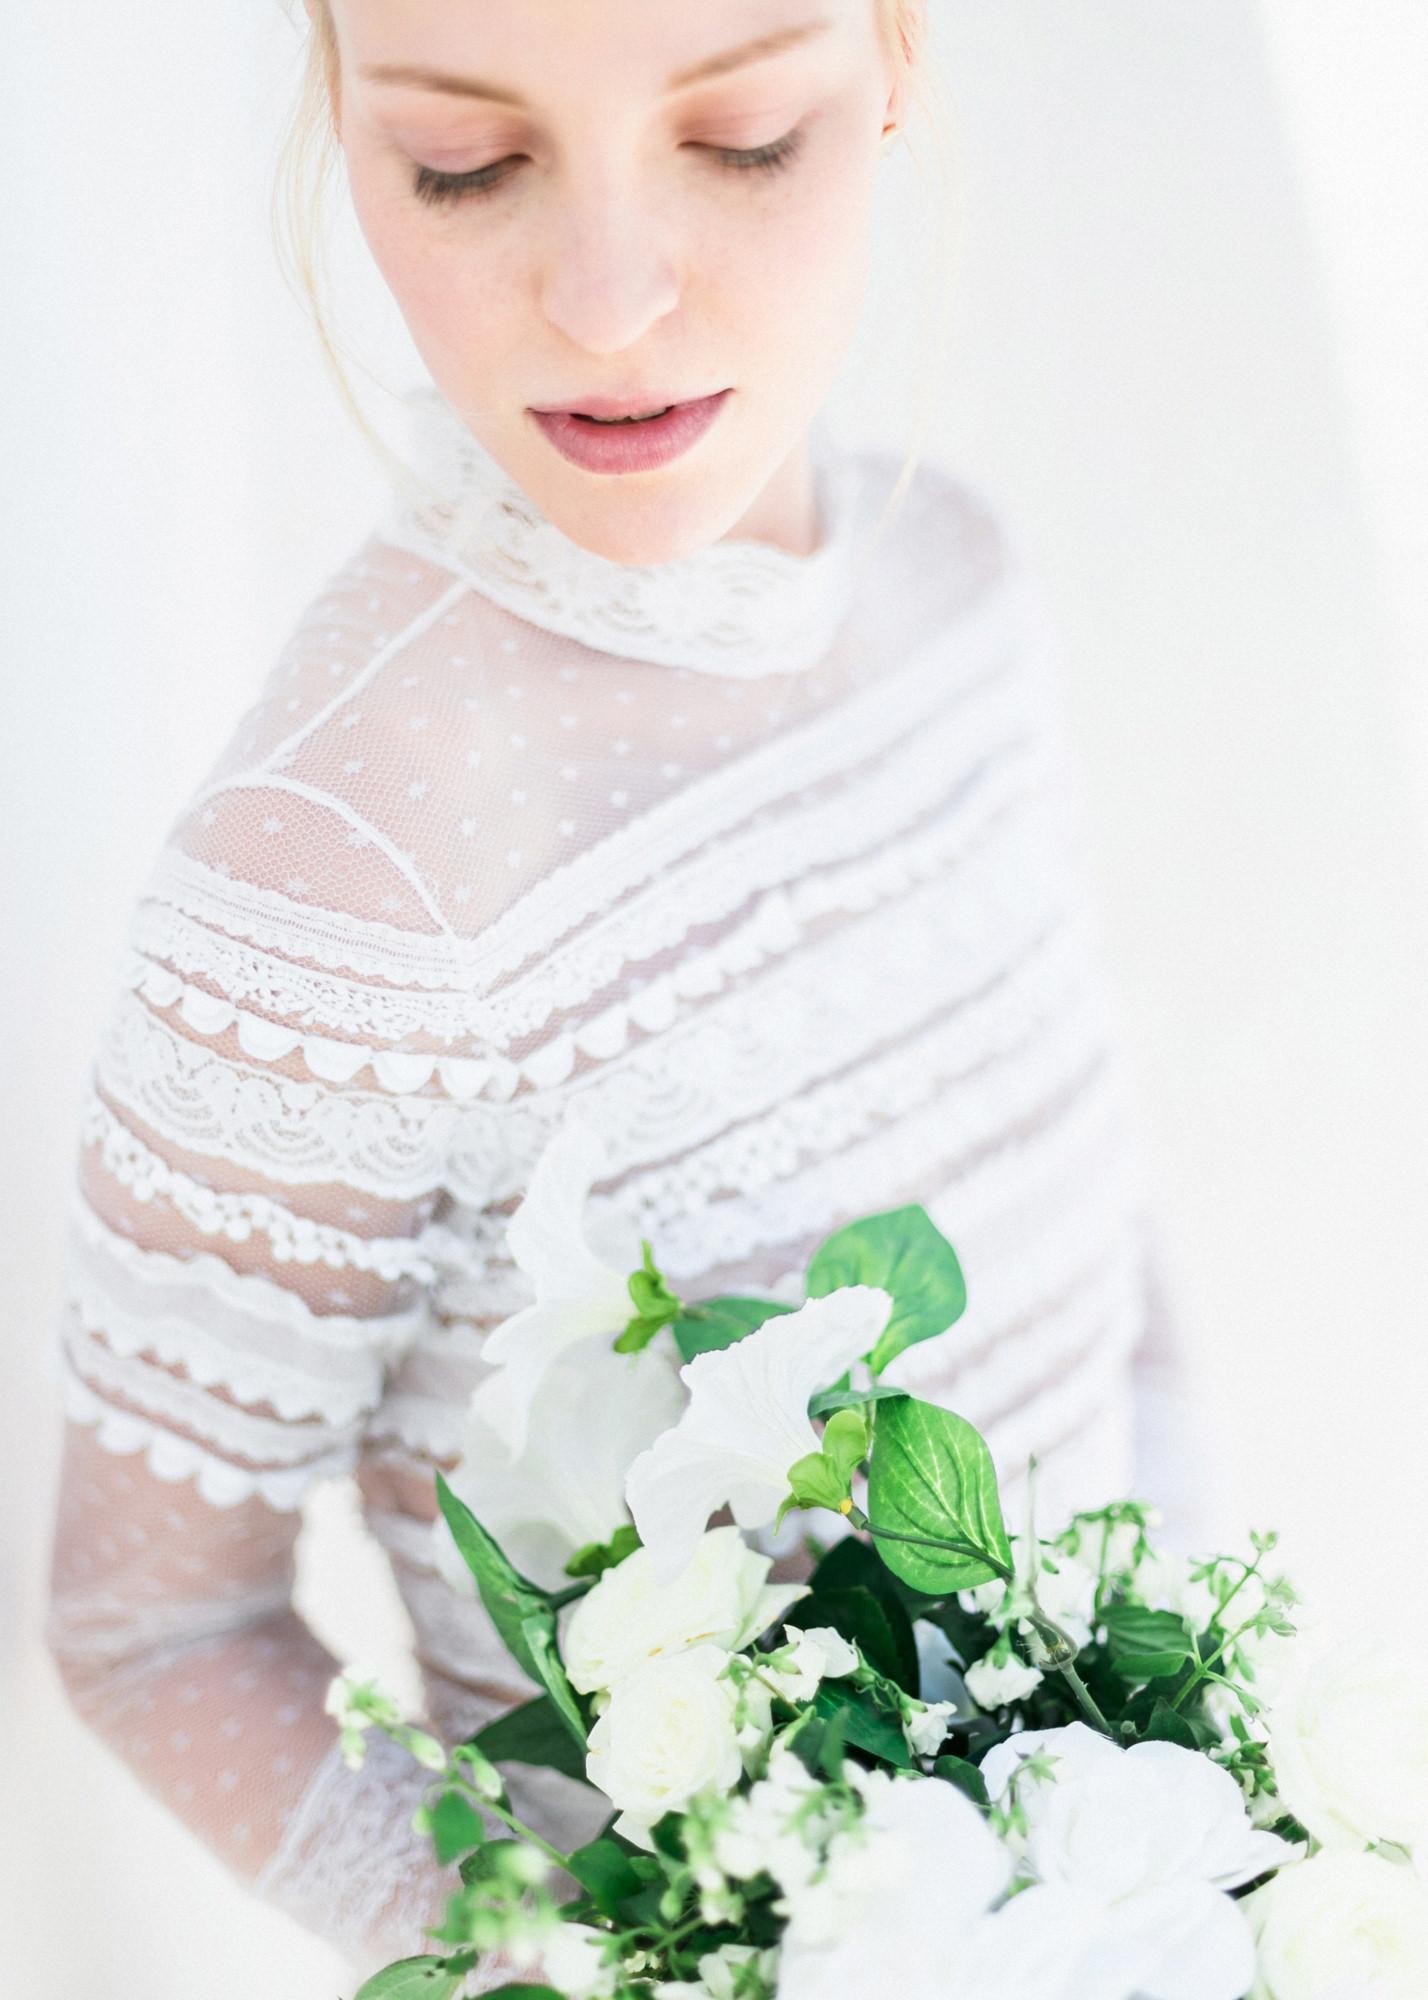 04-portrait-santorini-wedding-photographer-greece-b-v